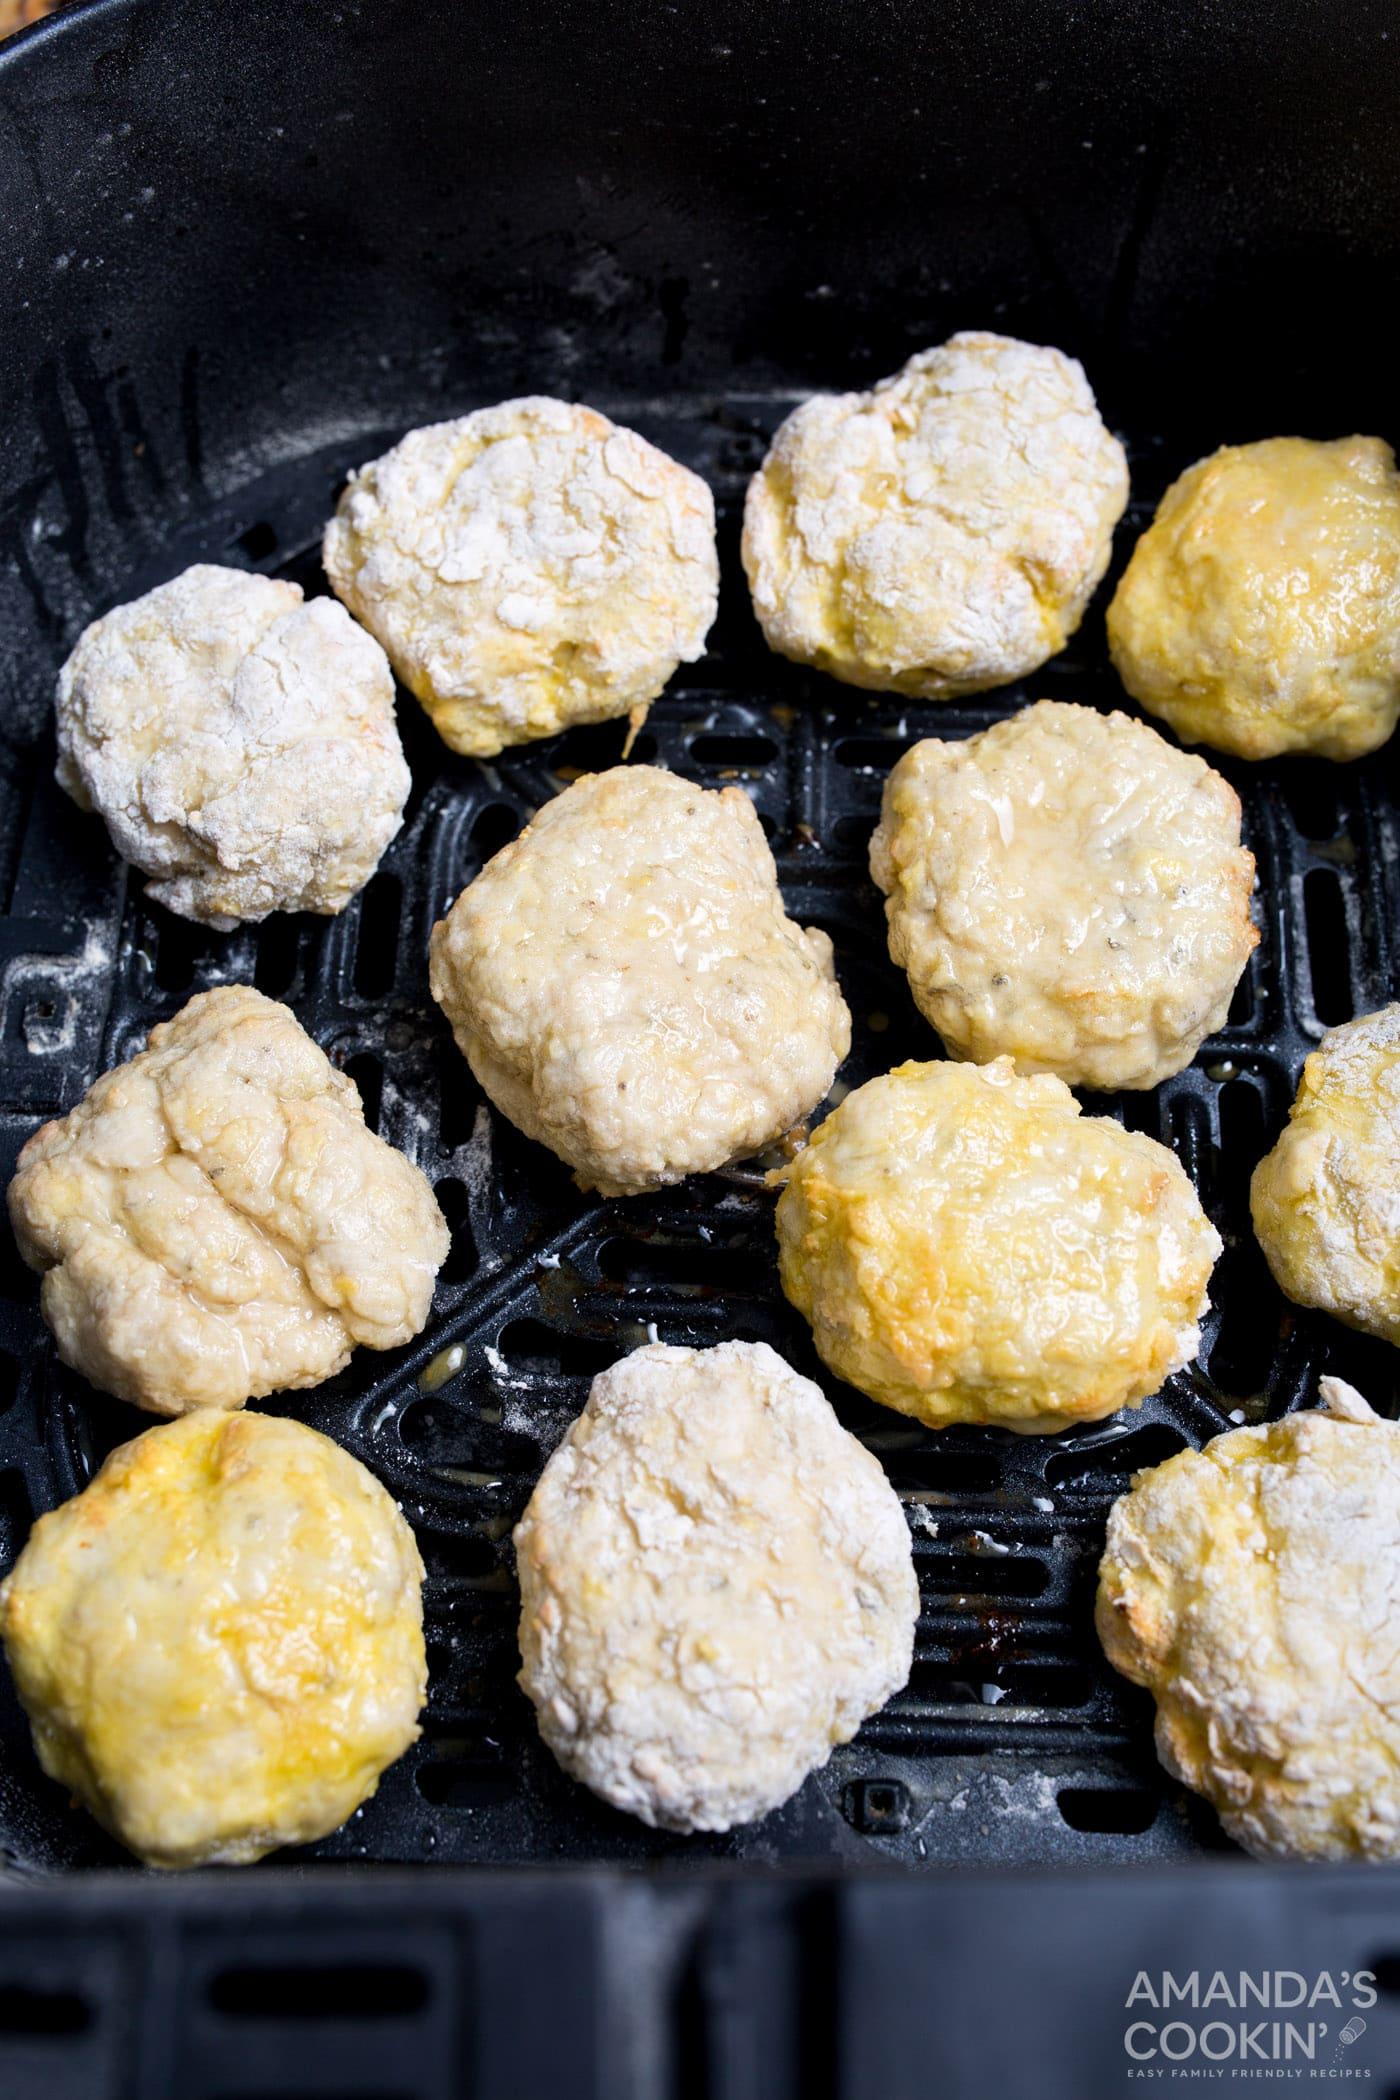 uncooked air fryer chicken nuggets in air fryer basket